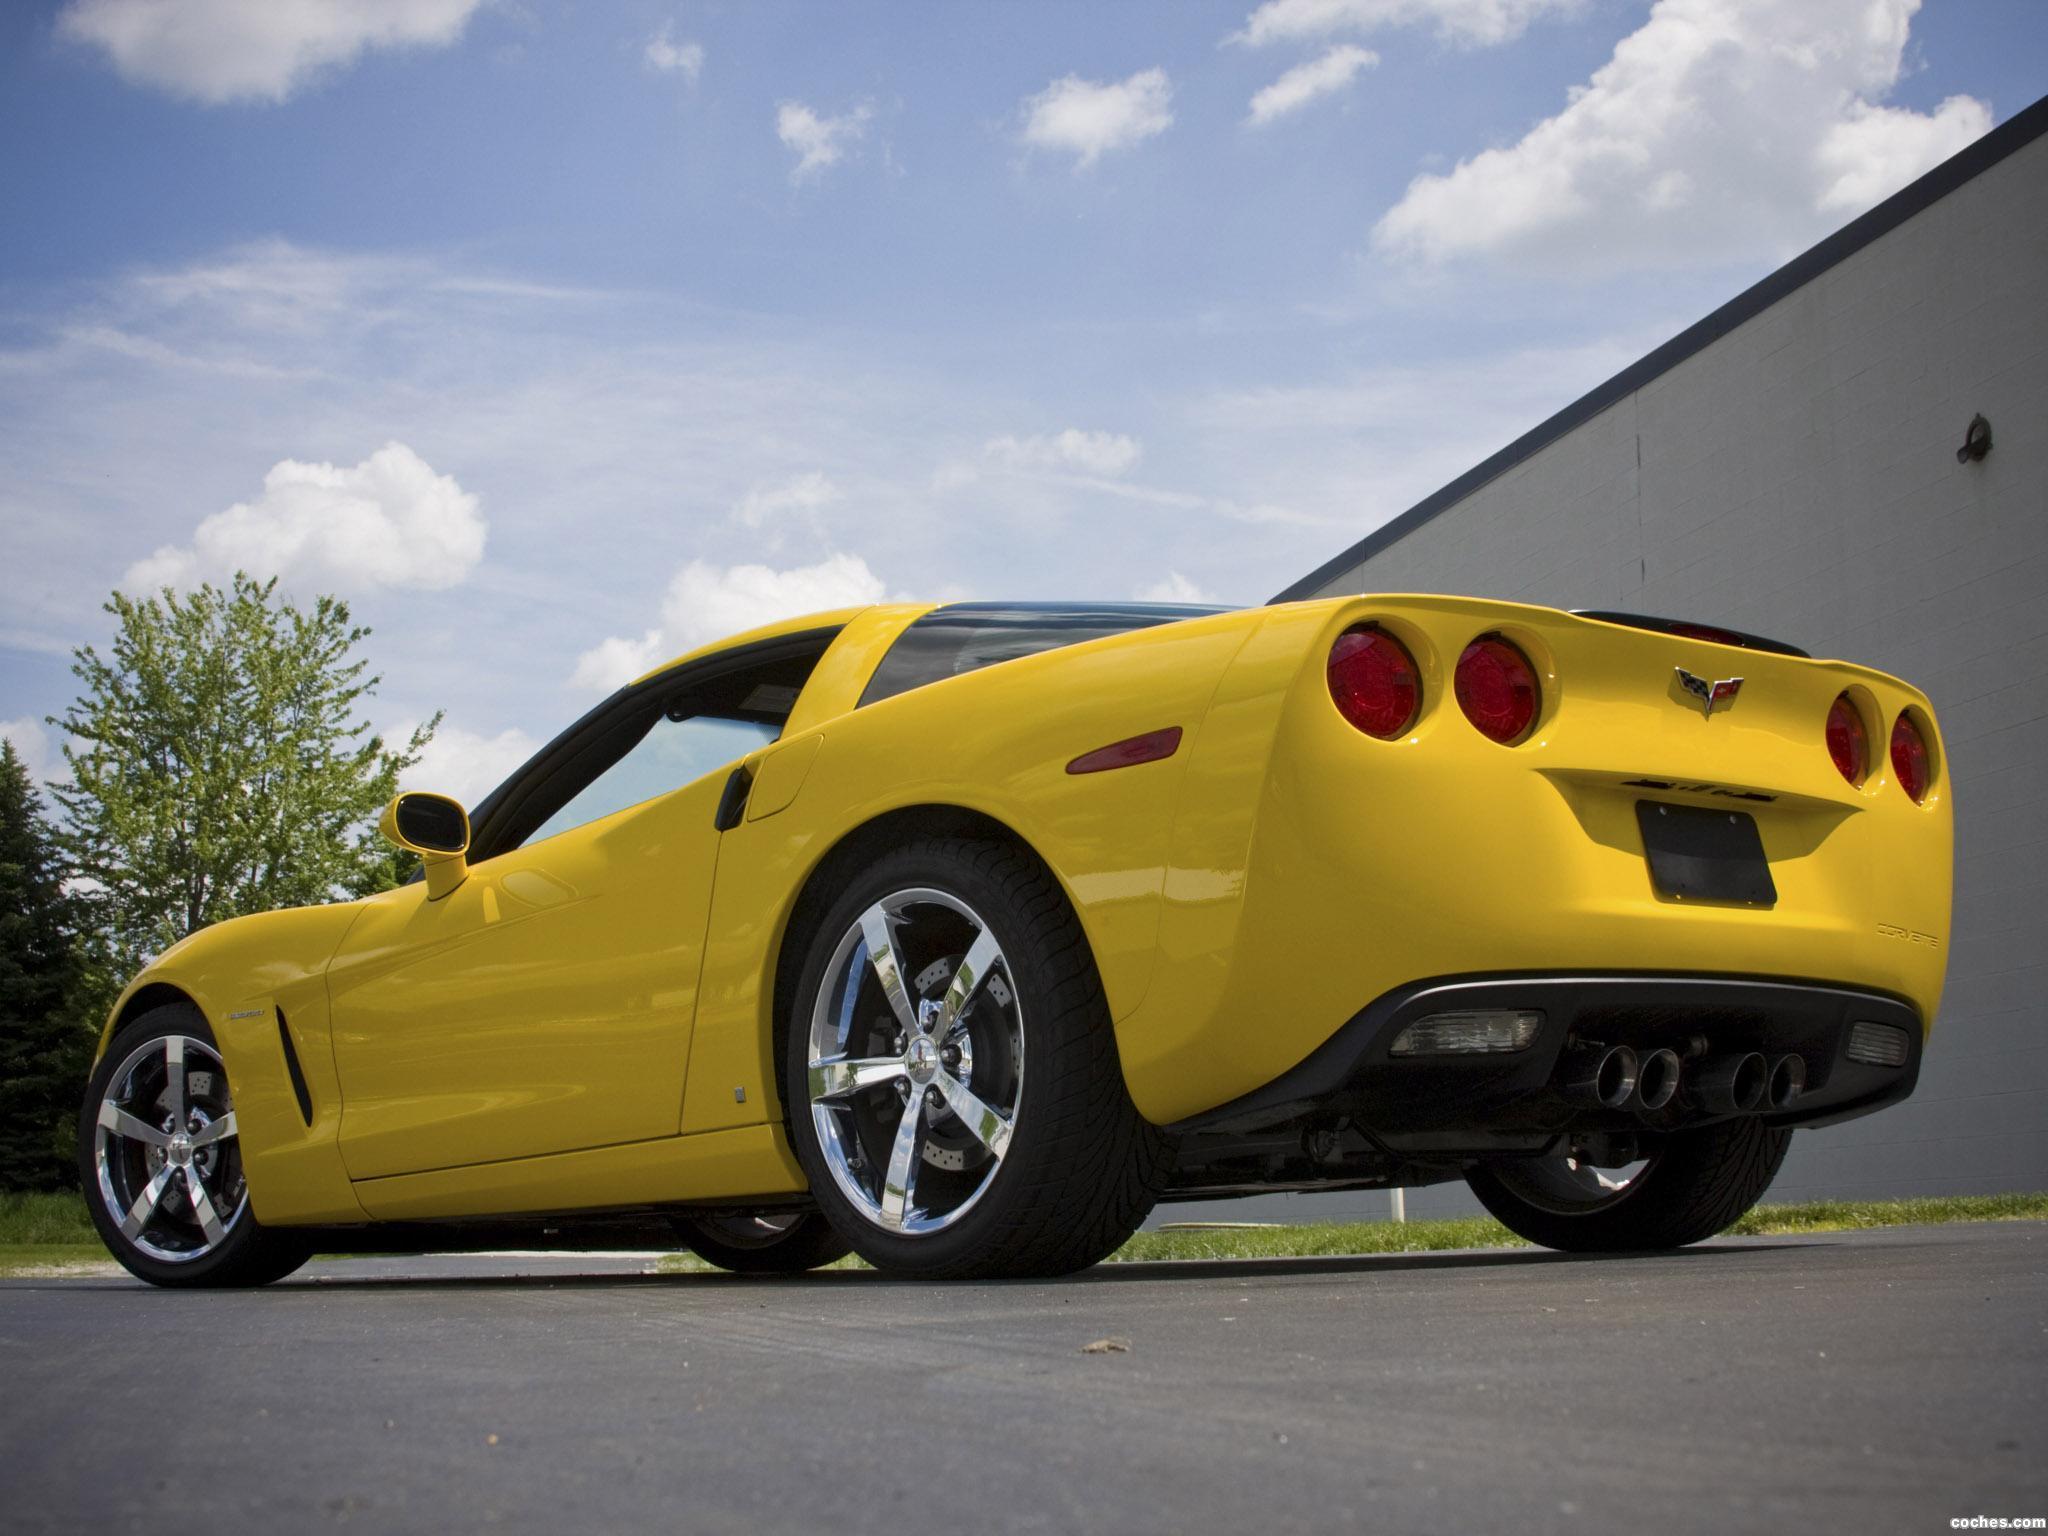 Foto 3 de Lingenfelter Chevrolet Corvette C6 670 cv Supercharged LS3 2008